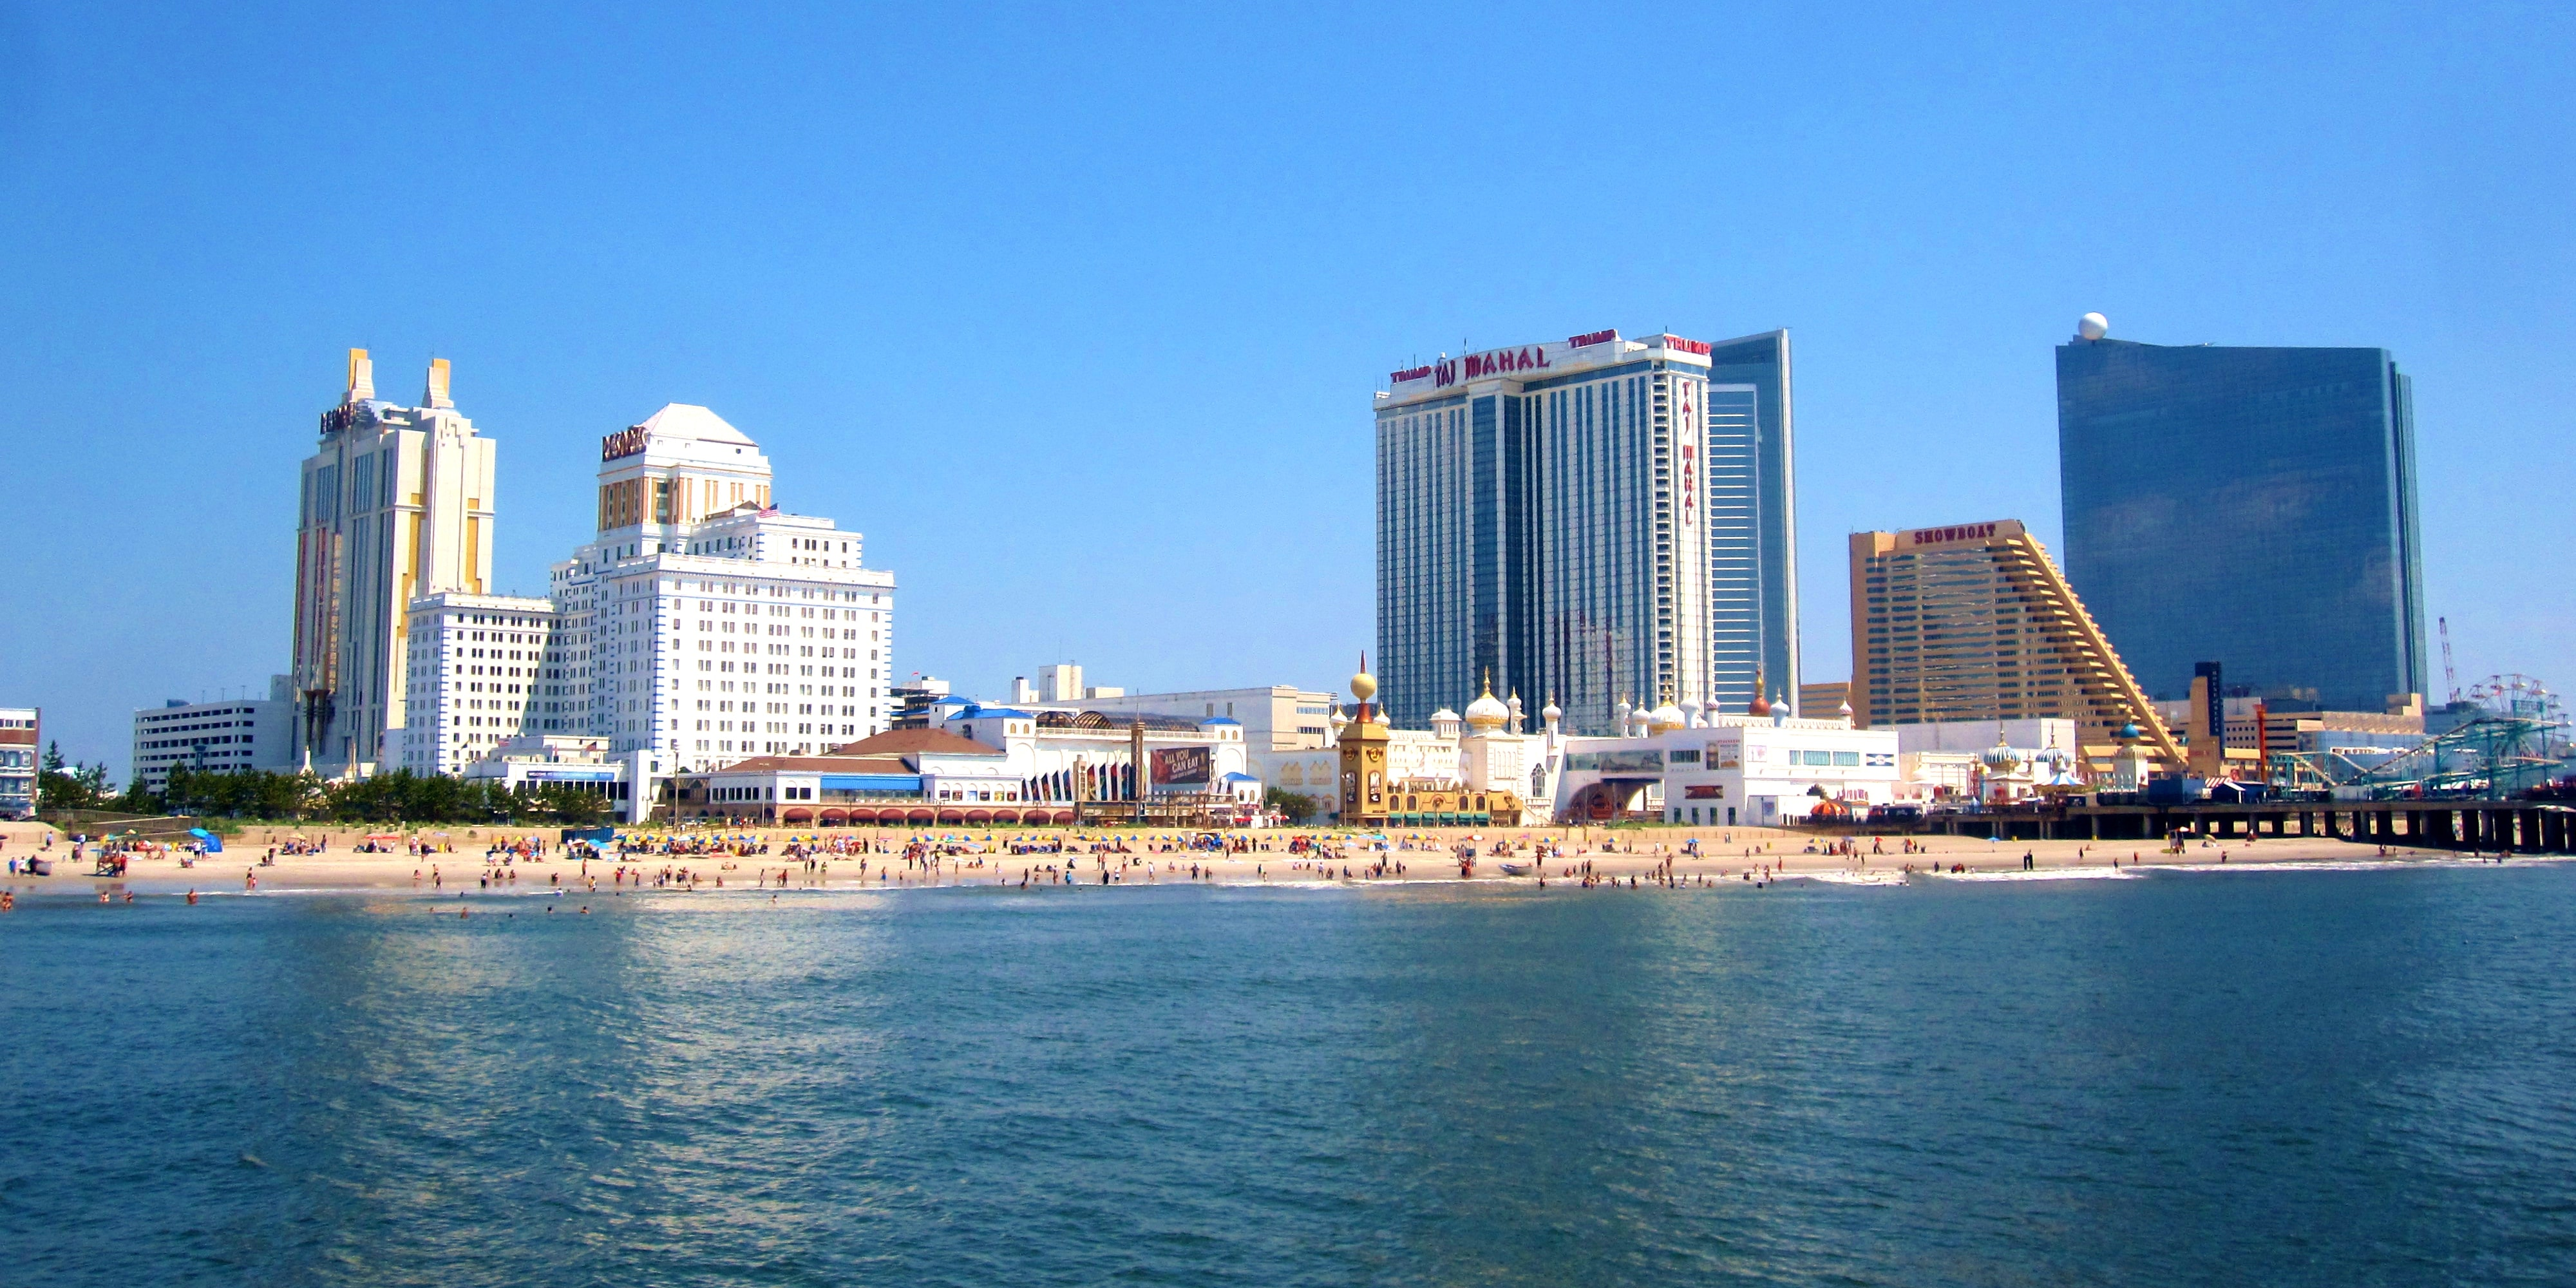 Hotels Atlantic City Boardwalk Nj